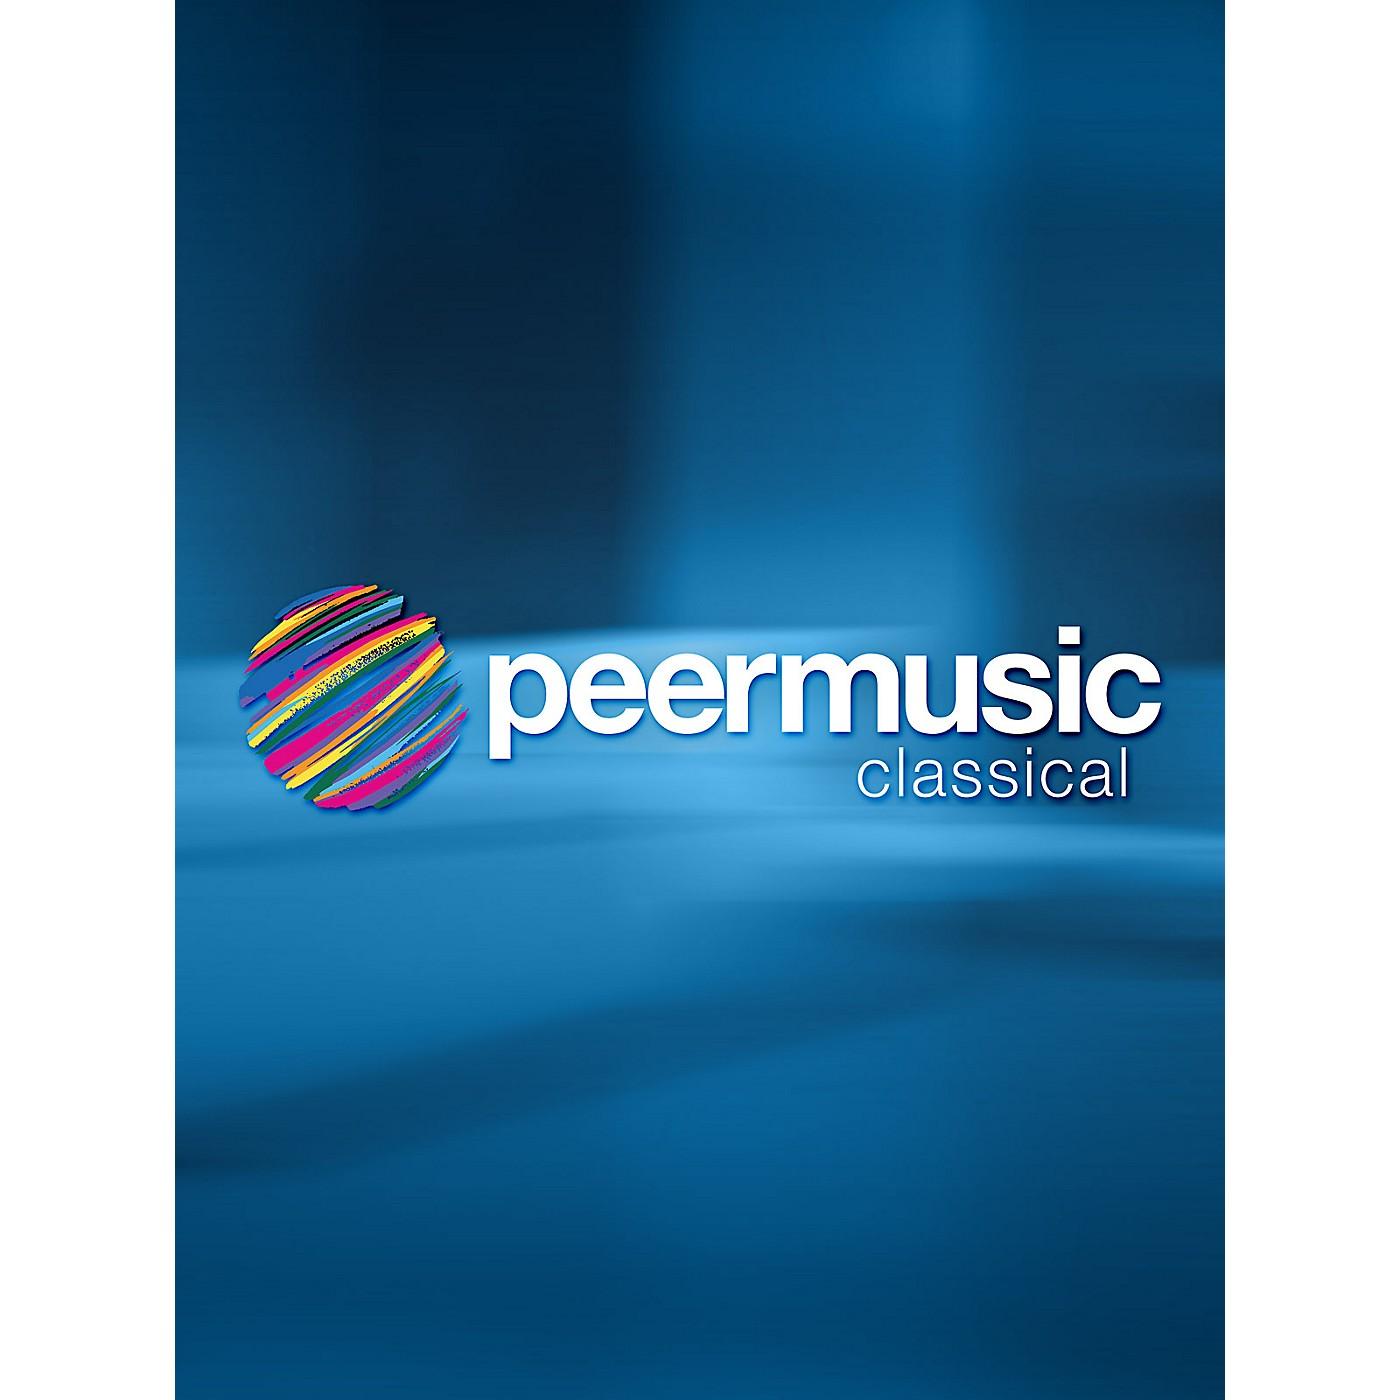 Peer Music Preludios Encadenados (Piano Solo) Peermusic Classical Series Softcover thumbnail